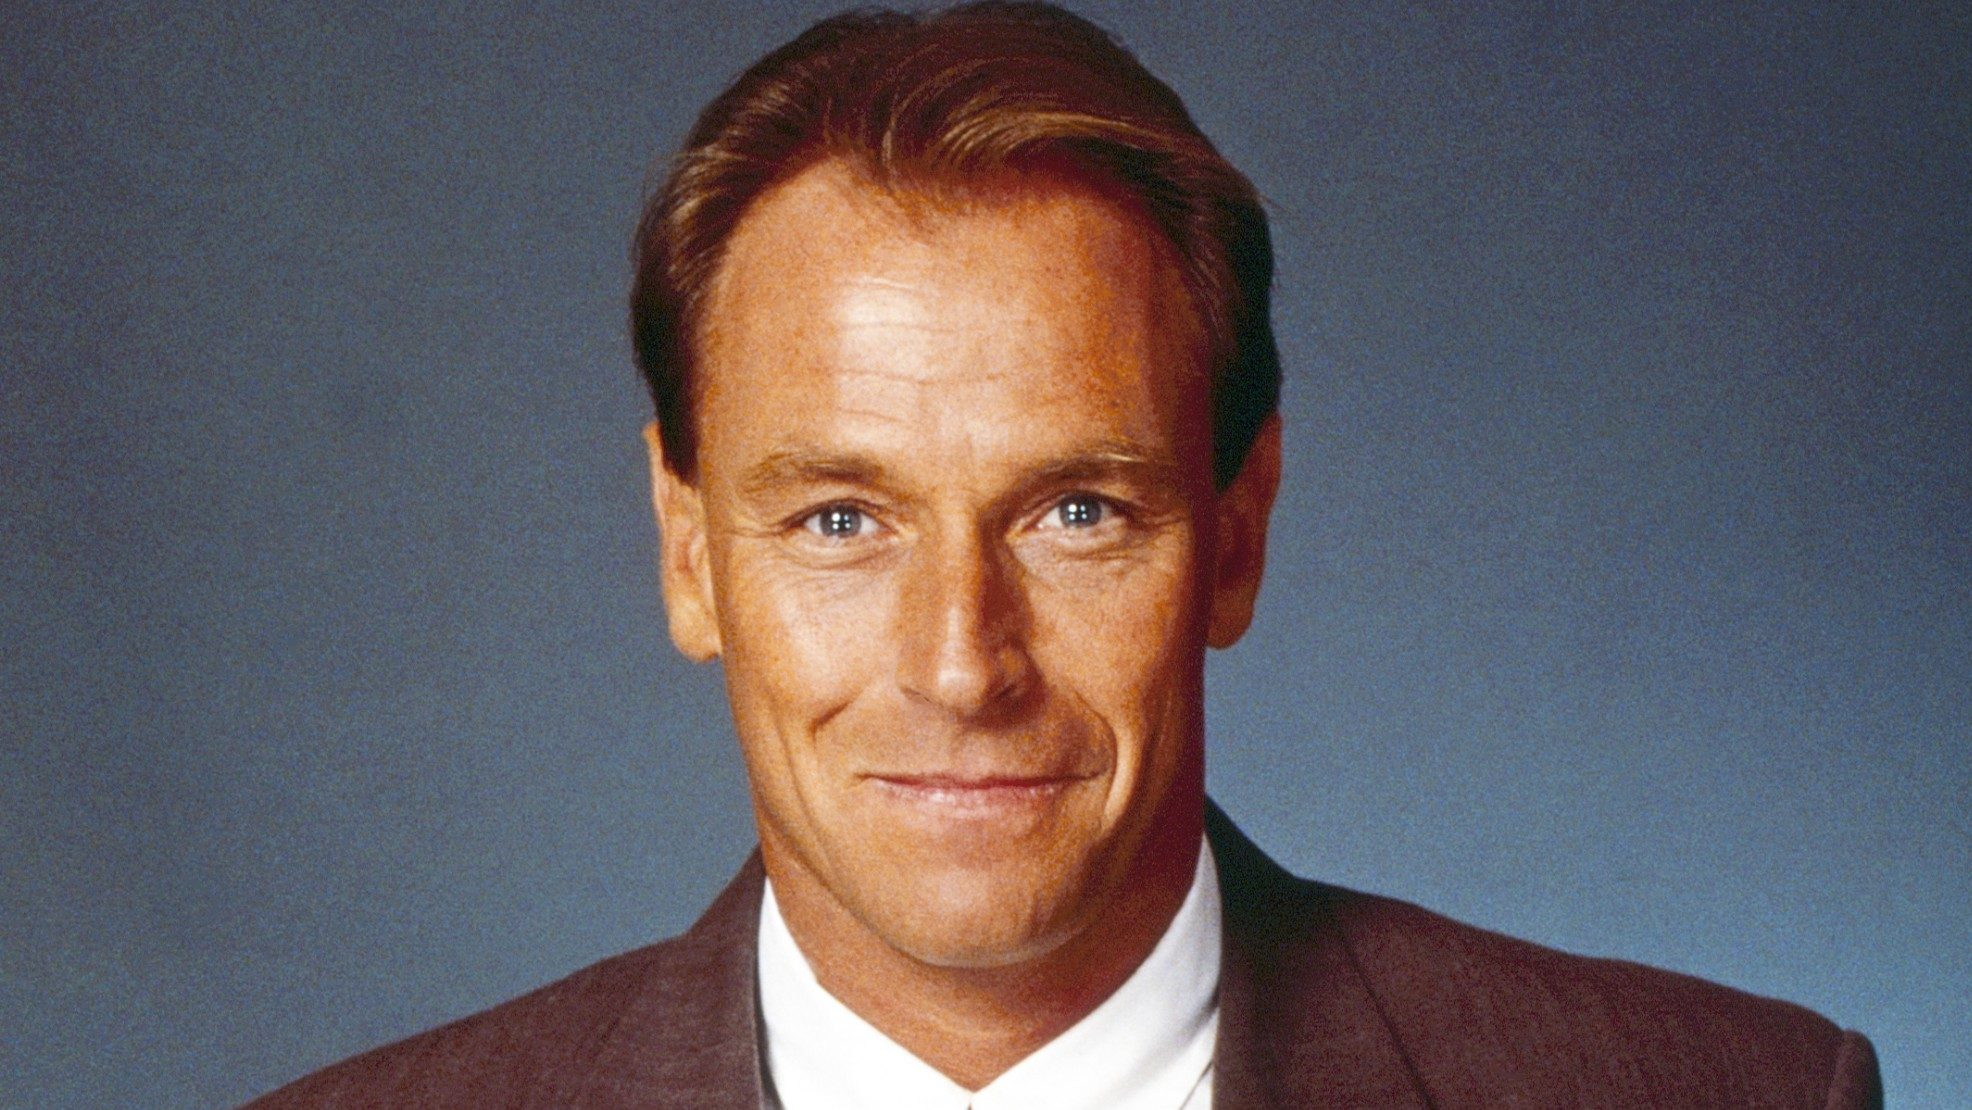 'LA Law': Corbin Bernsen Joins ABC Revival Pilot, Reprising His Role As Arnie Becker From Original